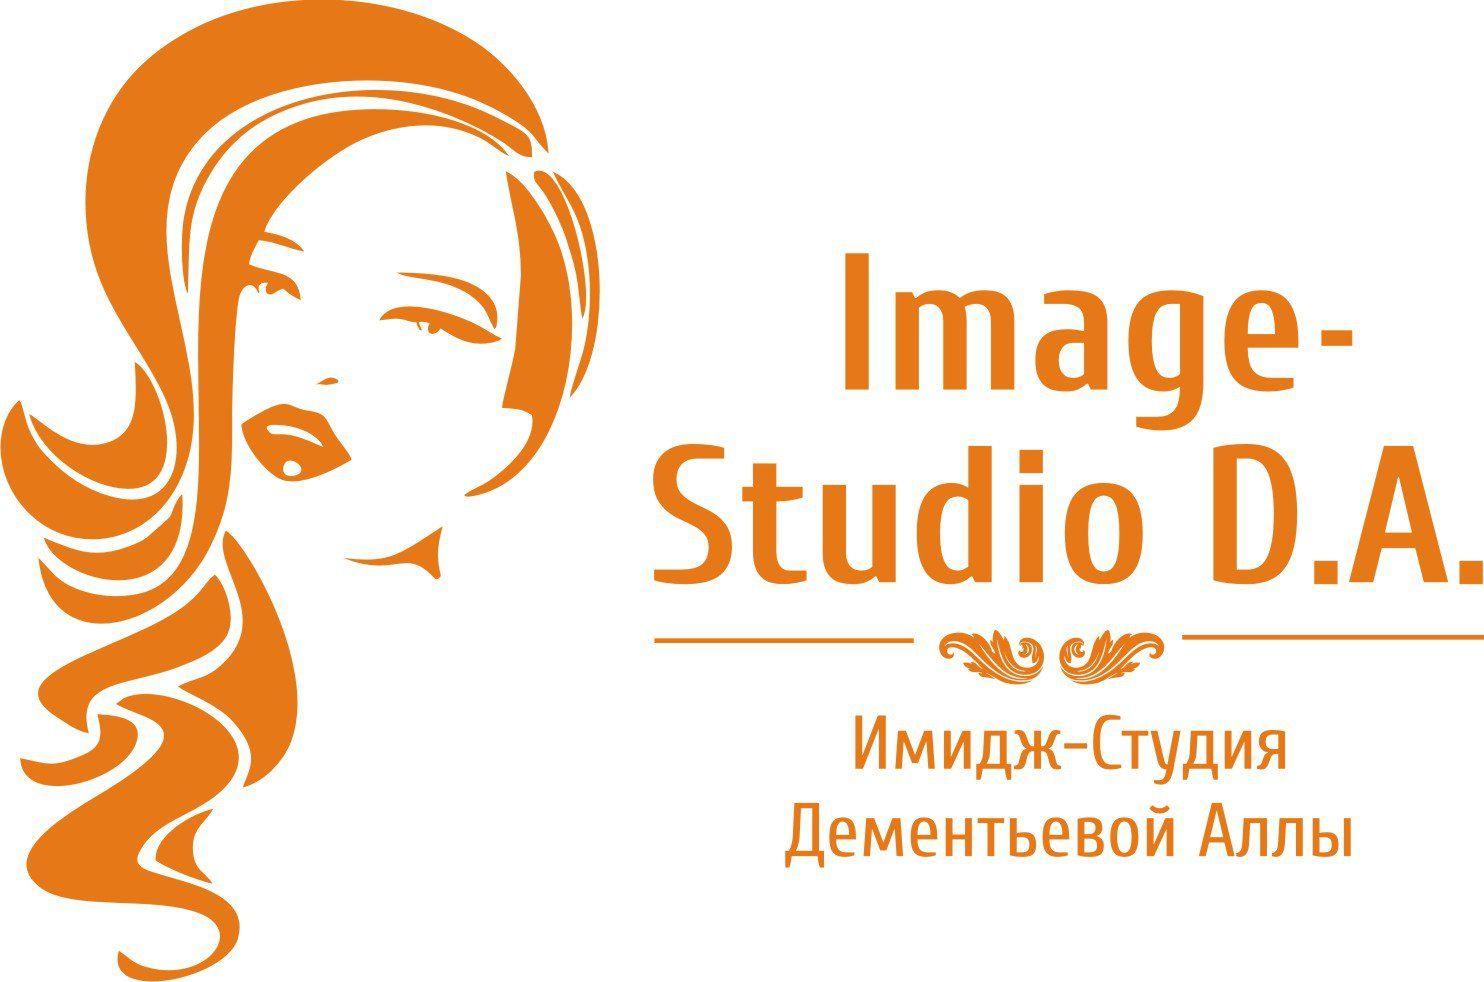 Image_Studio_D_A_logo.JPG